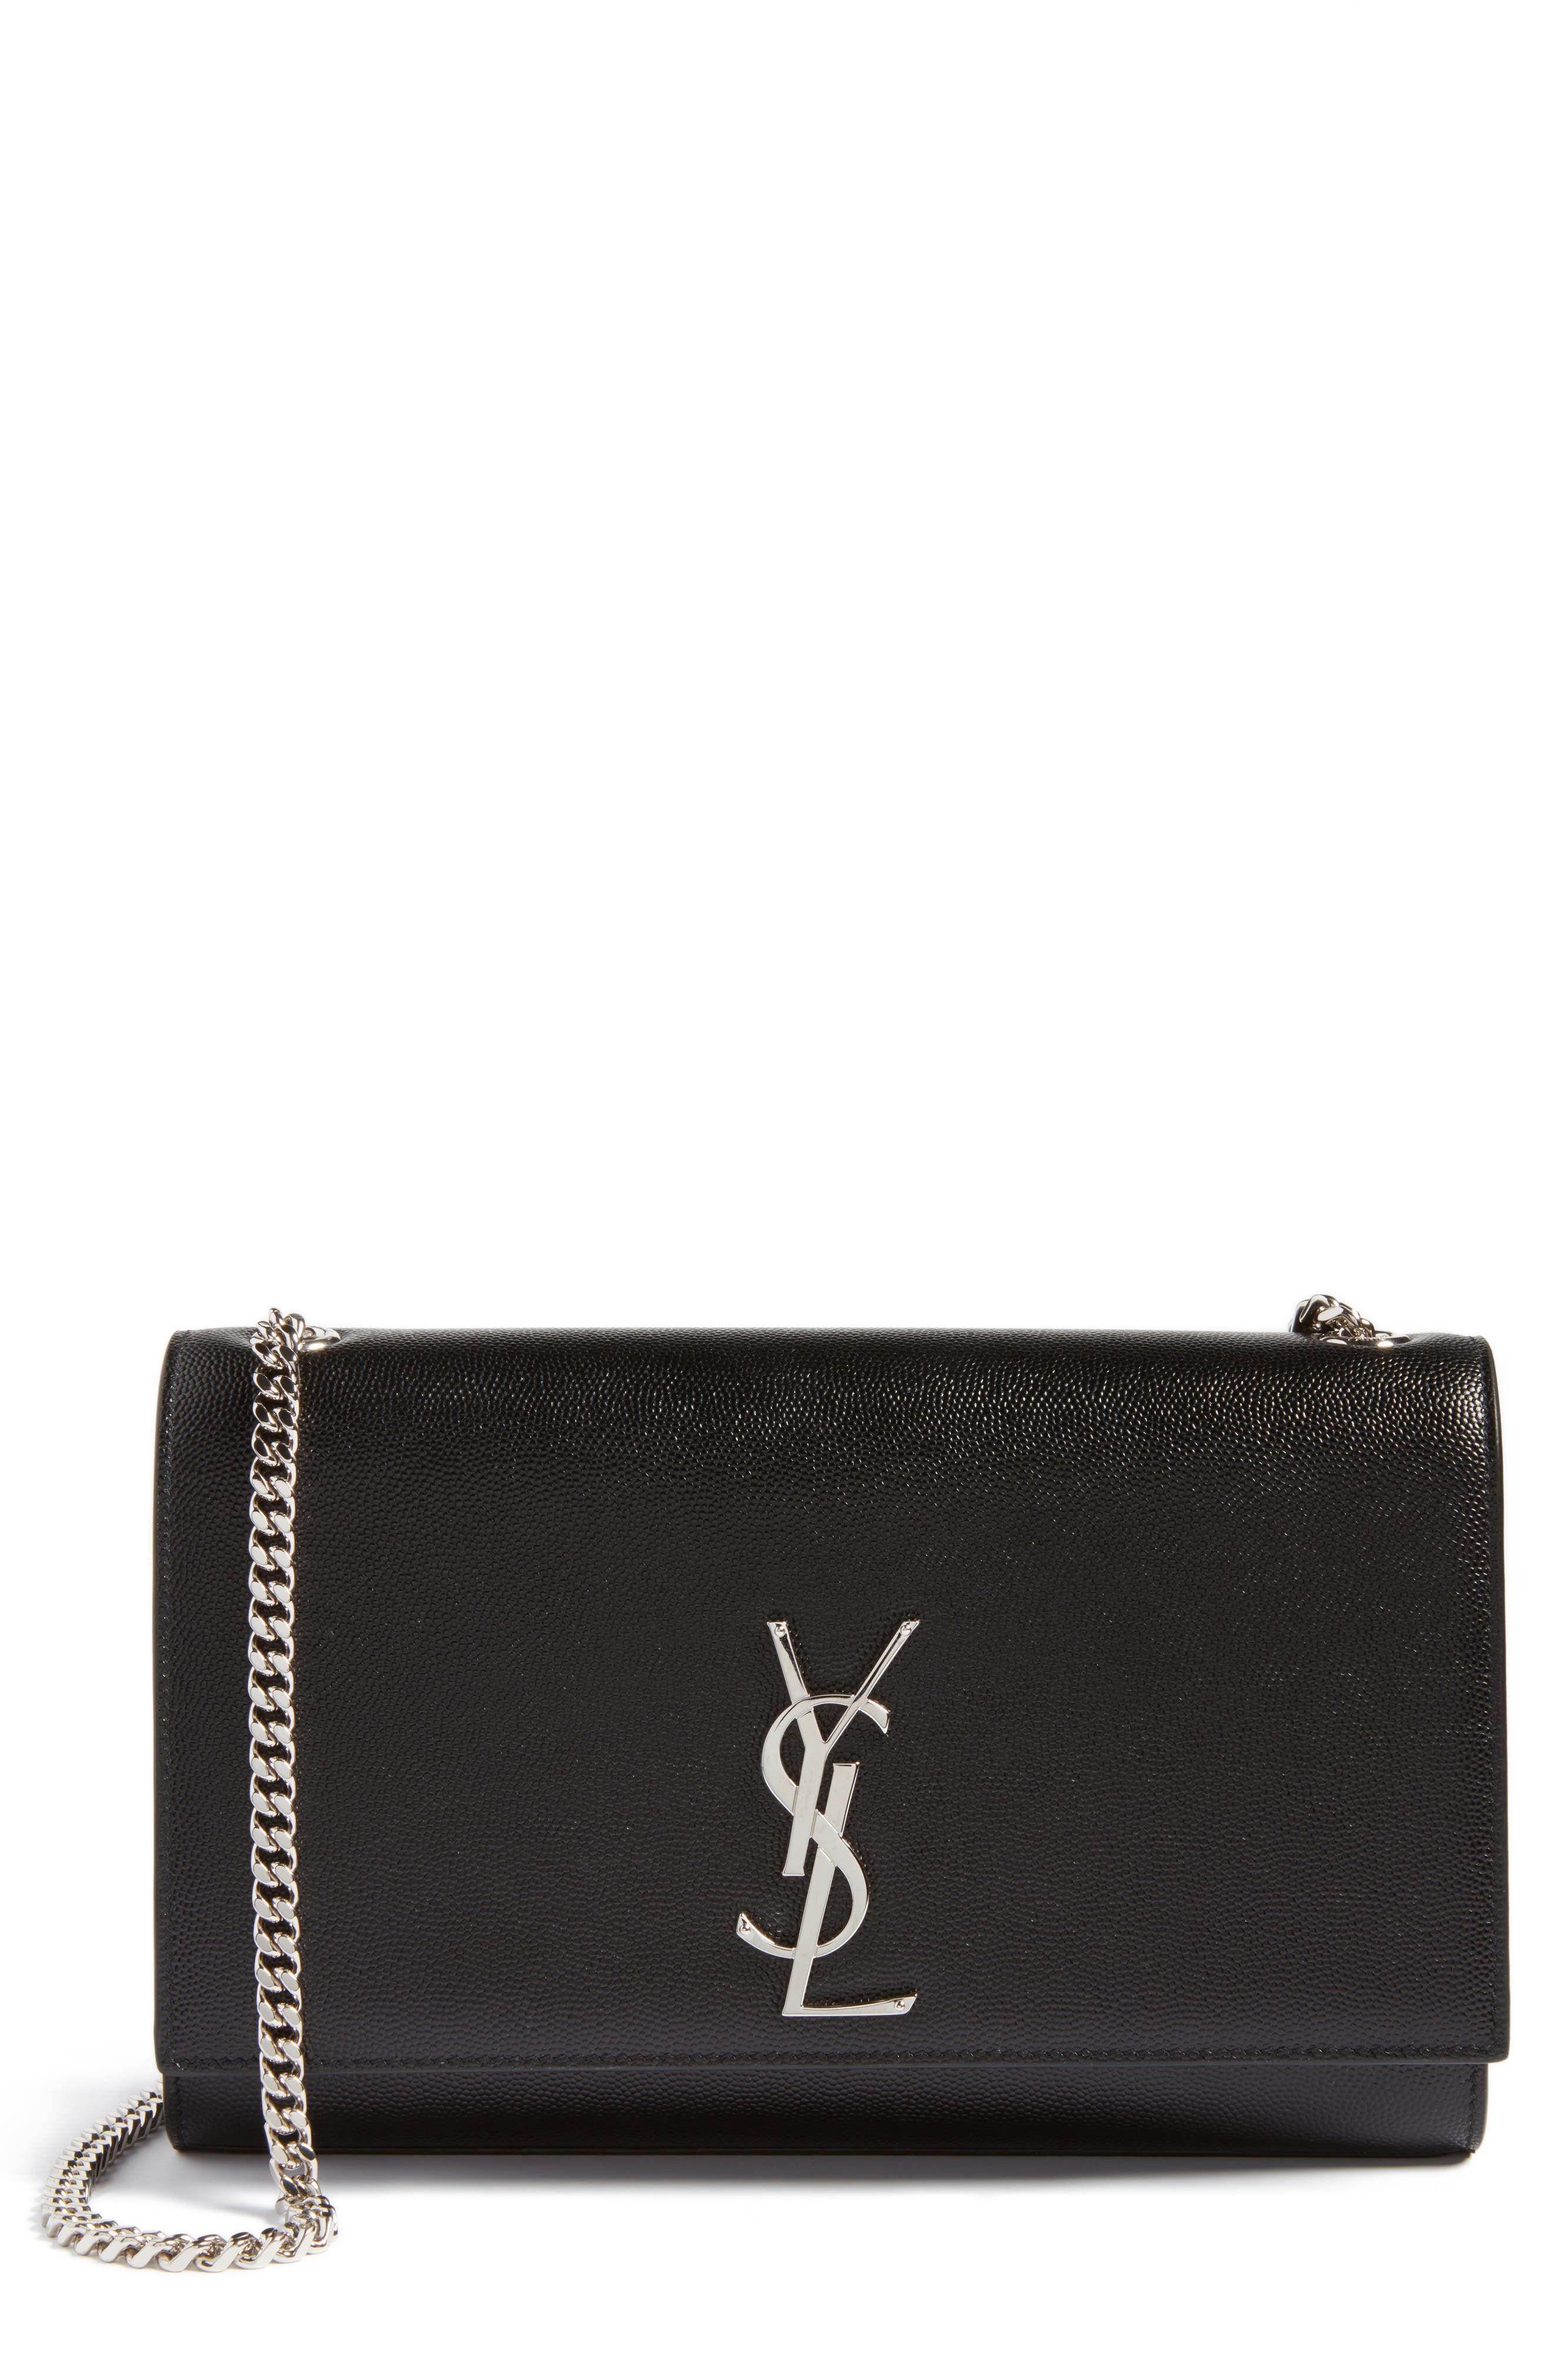 SAINT LAURENT, Medium Kate Calfskin Leather Shoulder Bag, Main thumbnail 1, color, NERO